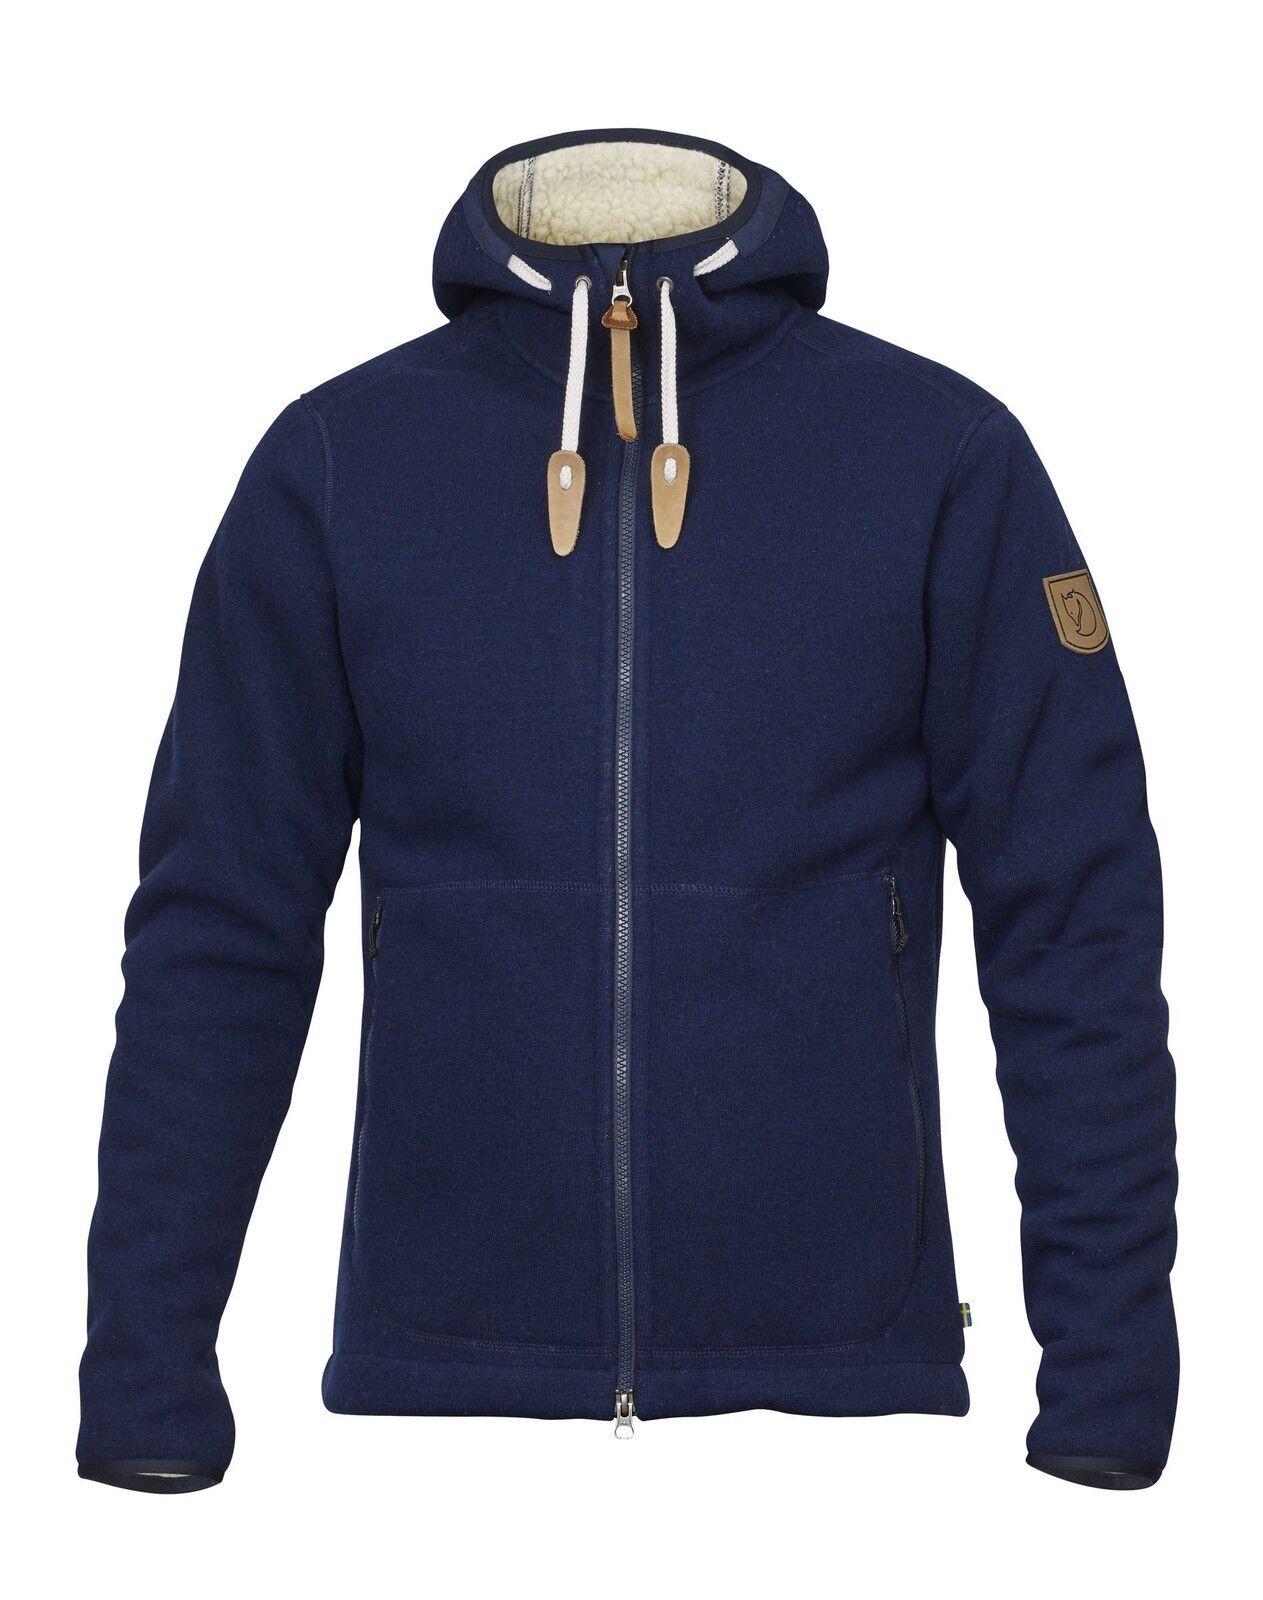 Fjäll Räven Polar Fleece Jacket M Gr.XXL navy